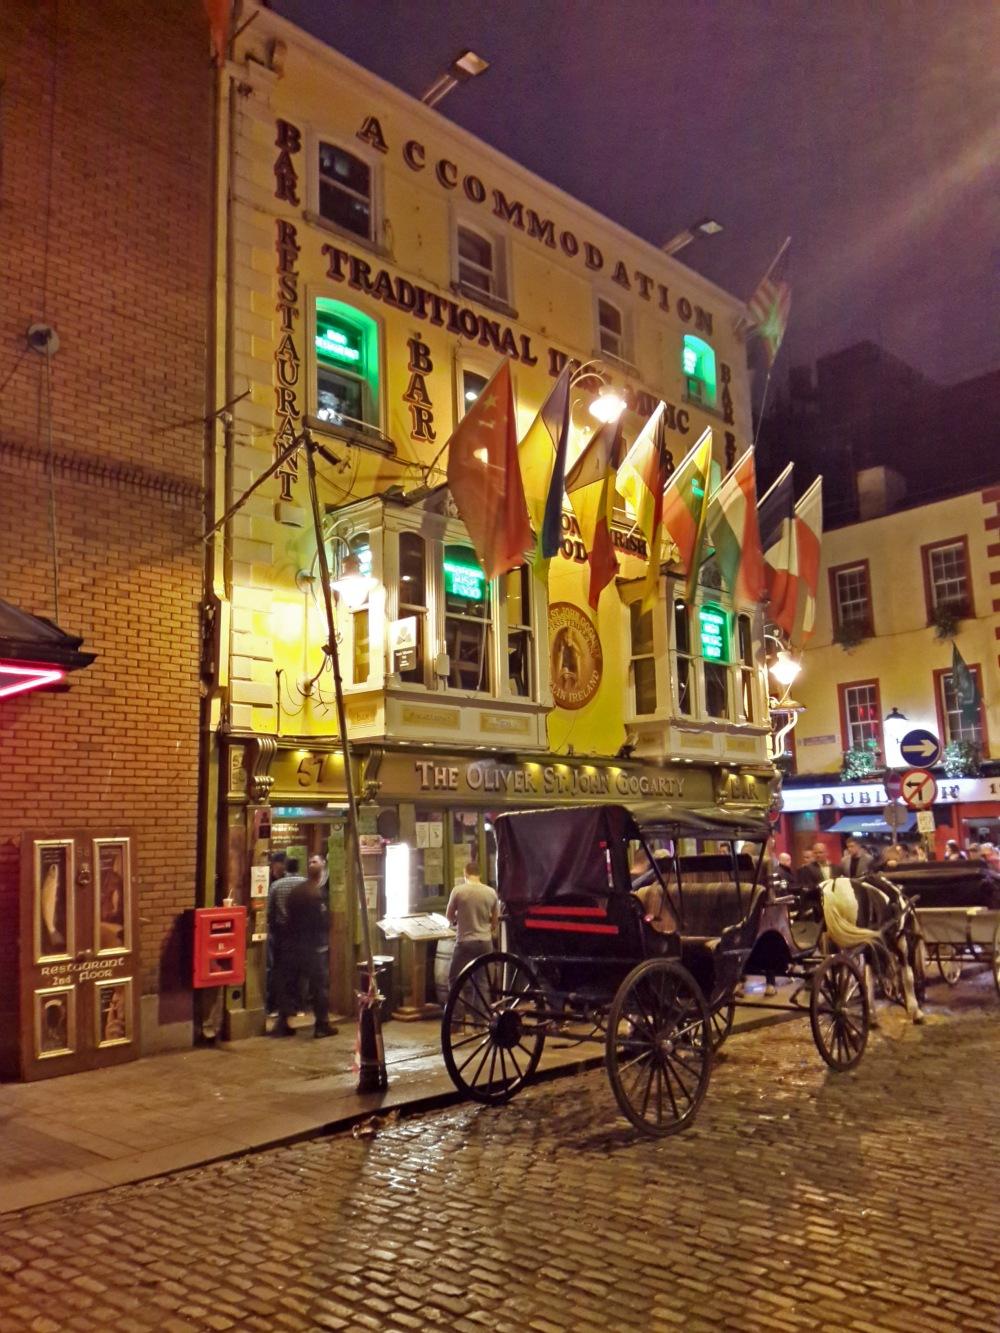 Temple Bar-Vita notturna di Dublino-Dublino-Irlanda-Locali-Pub-Birra-Whiskey